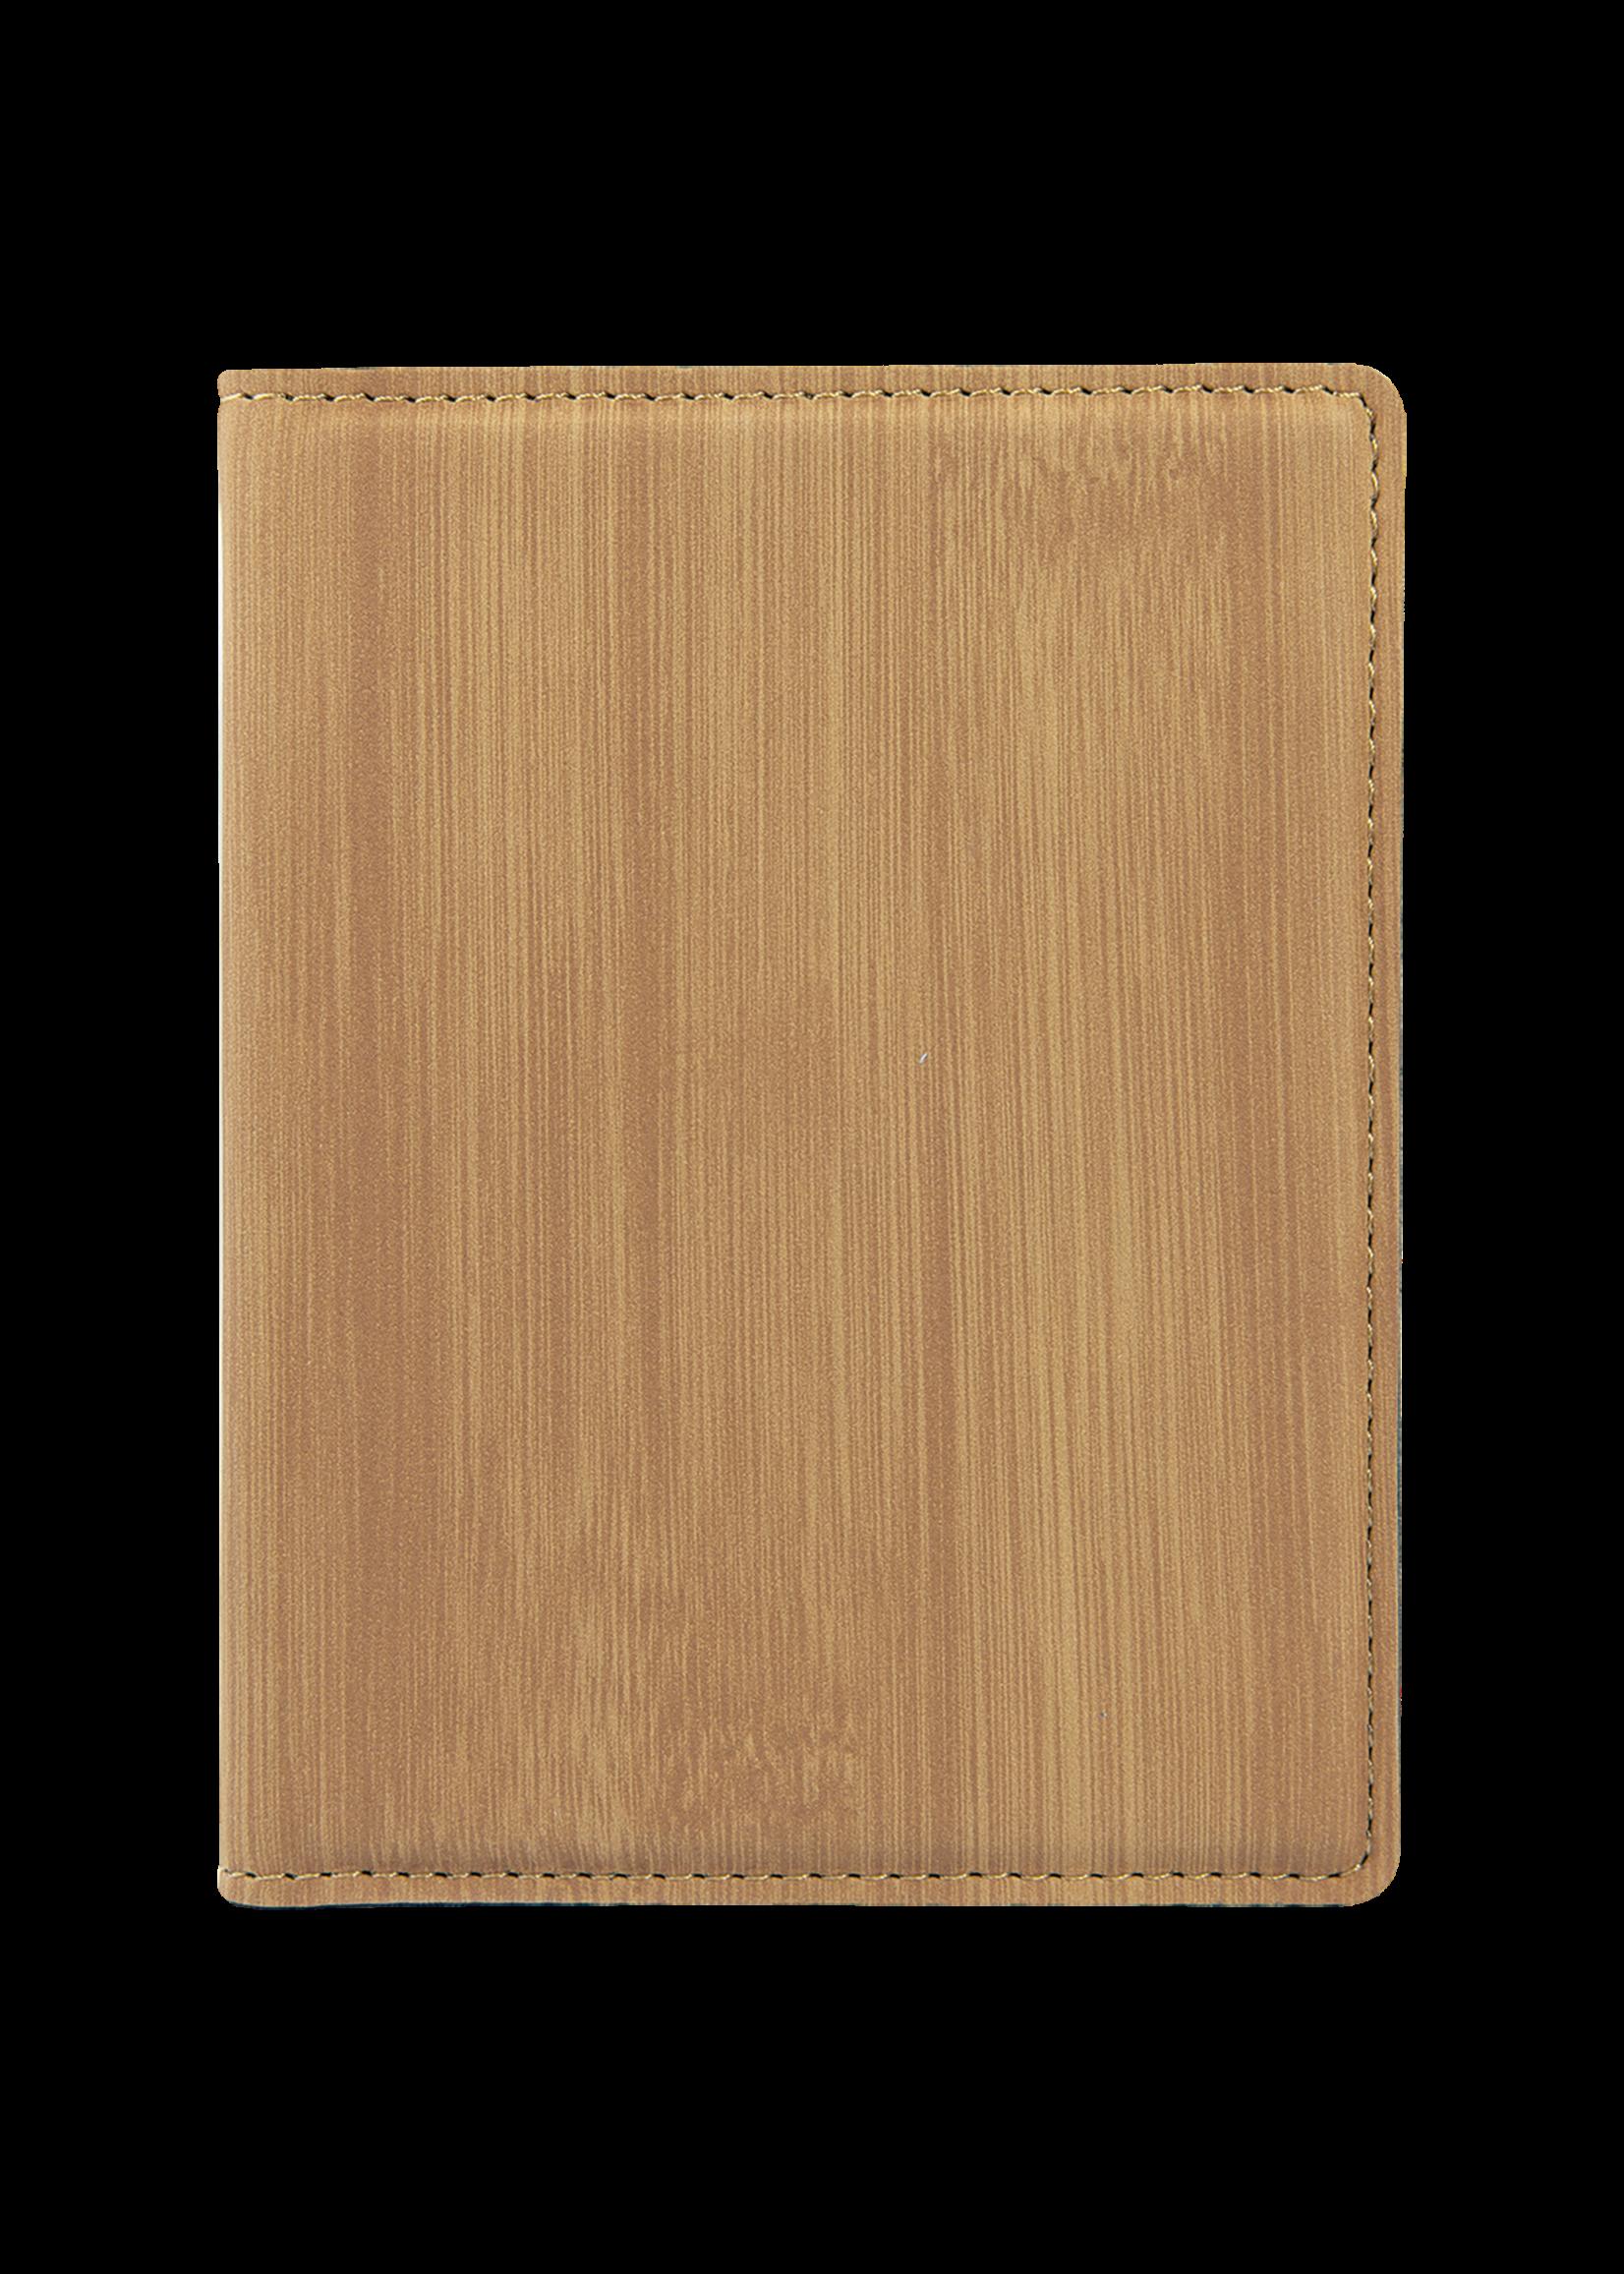 "Leatherette Passport Holder 108mm x 140mm (4.25x5.5"")"